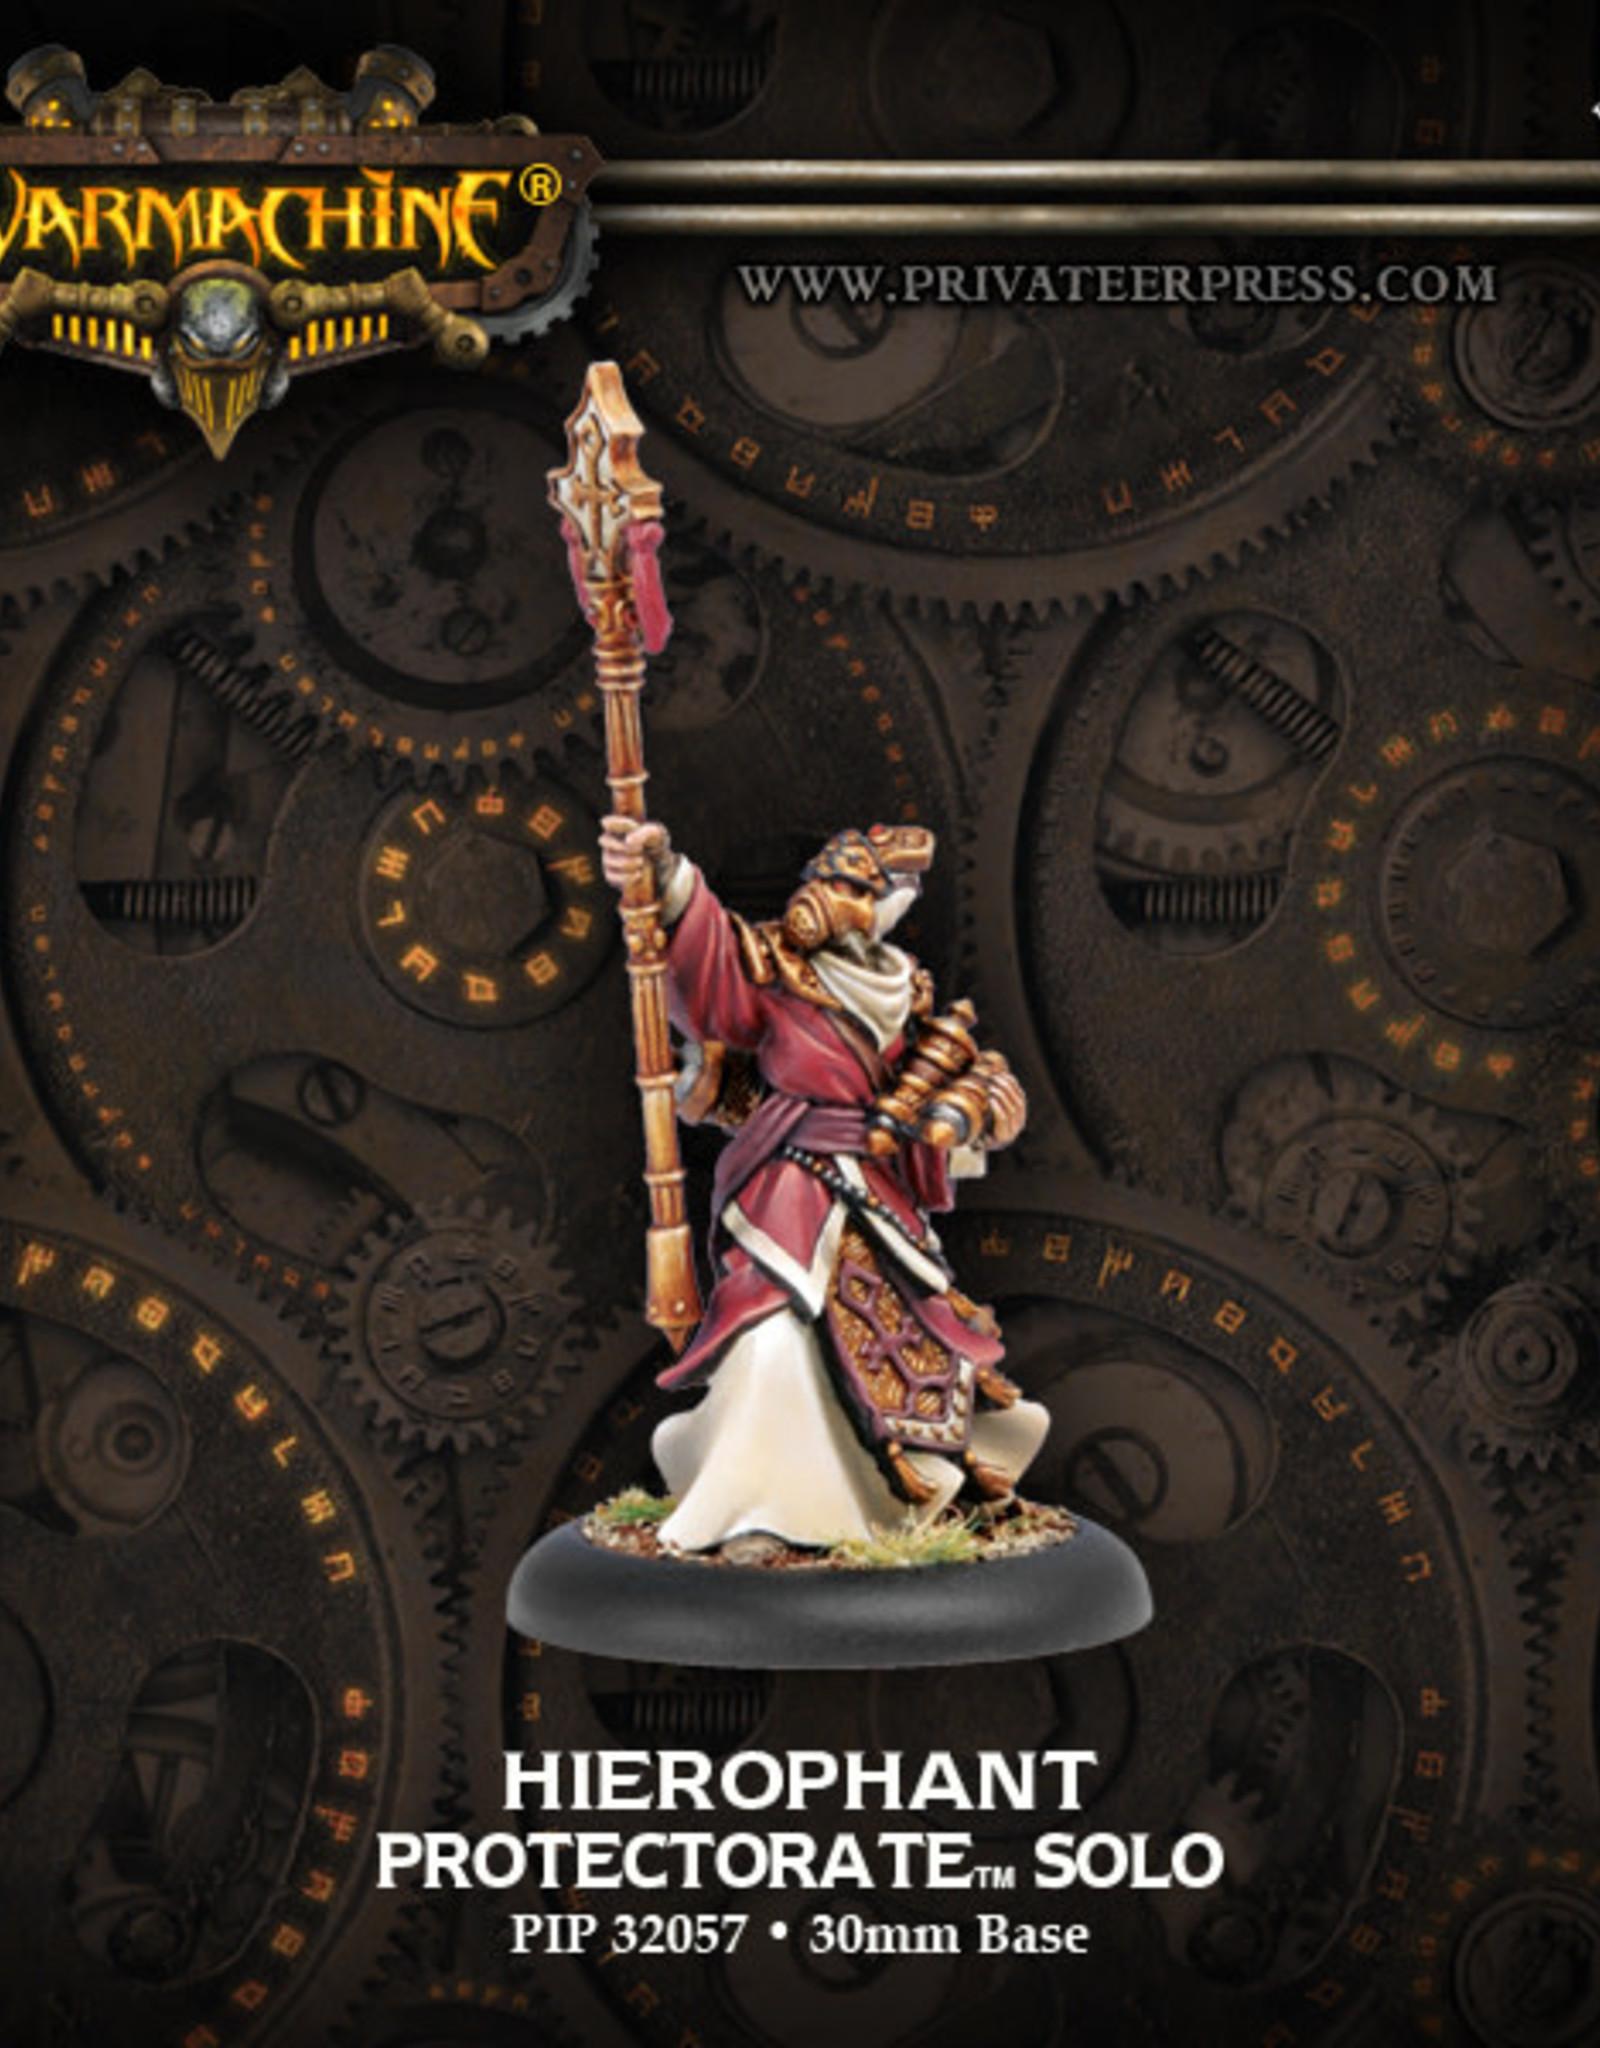 Warmachine Protectorate - Hierophant